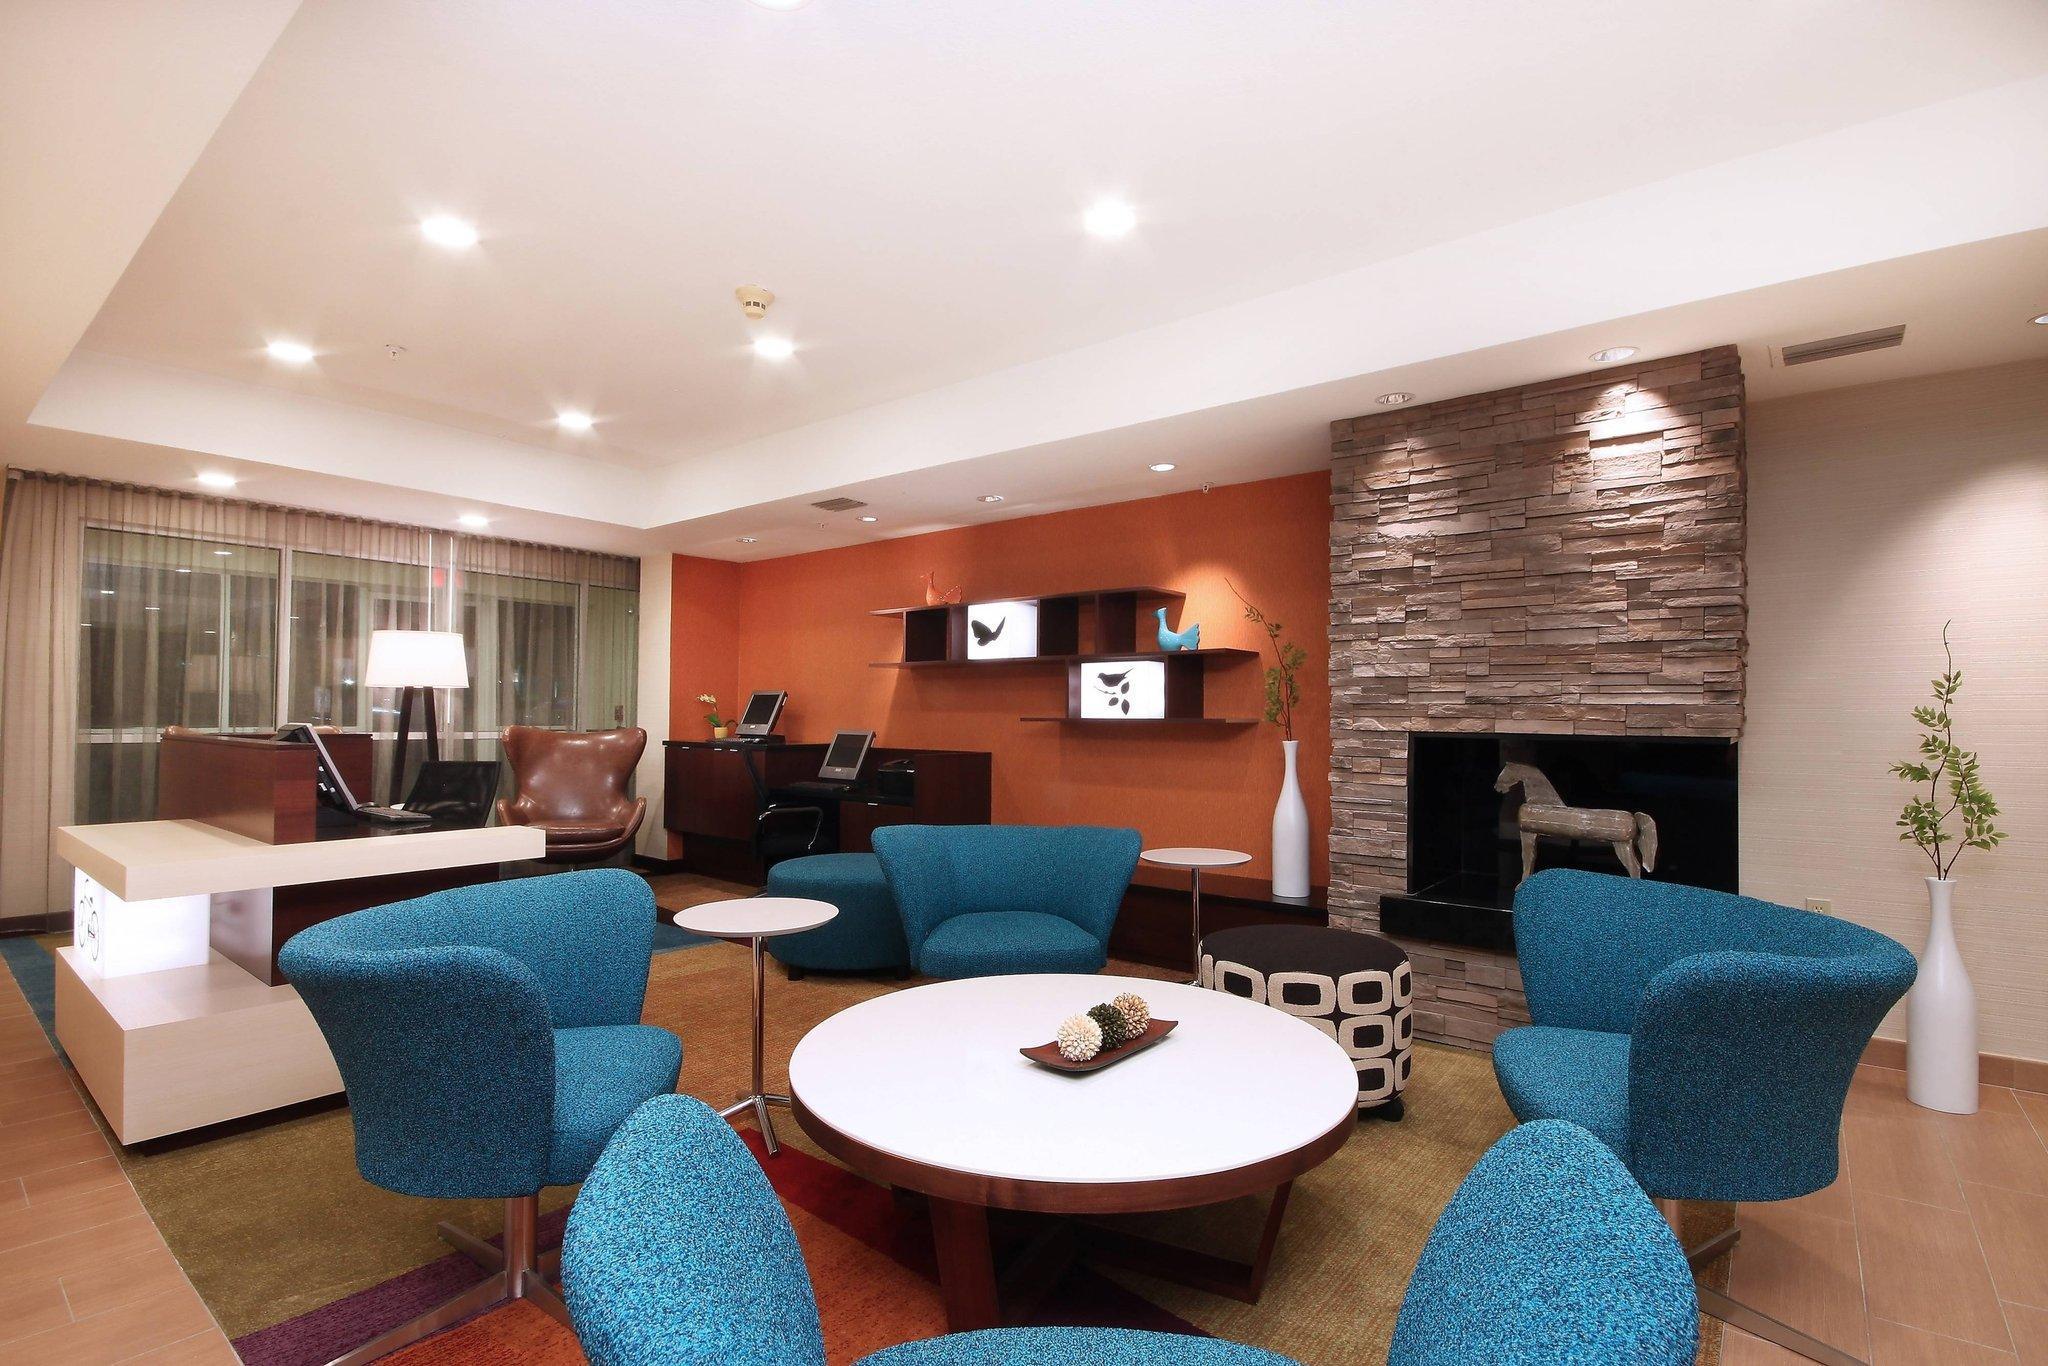 Fairfield Inn And Suites Dallas Las Colinas